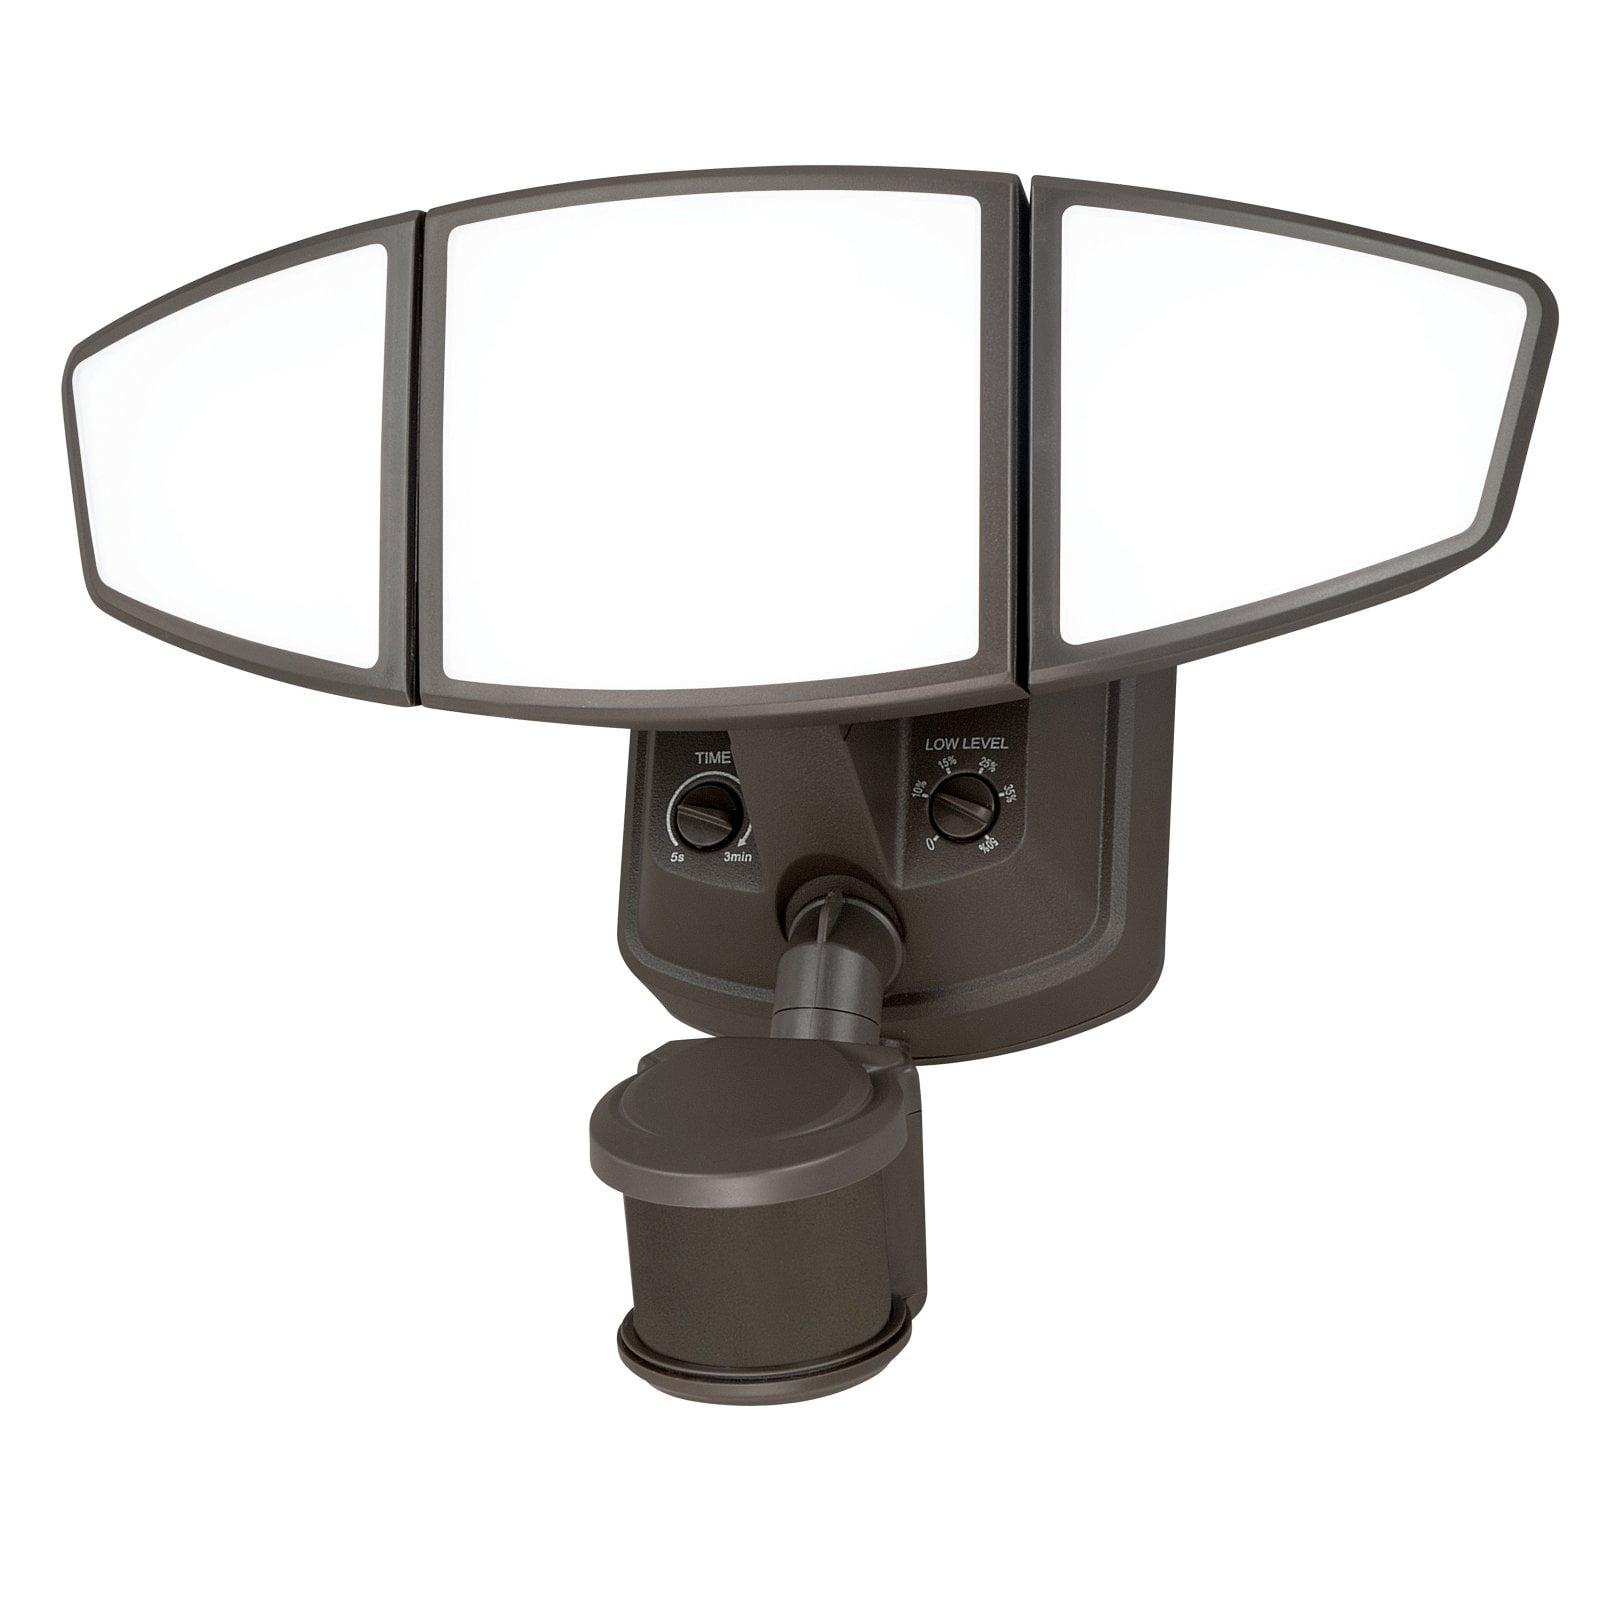 Vaxcel Omega T0103 Outdoor Motion Sensor